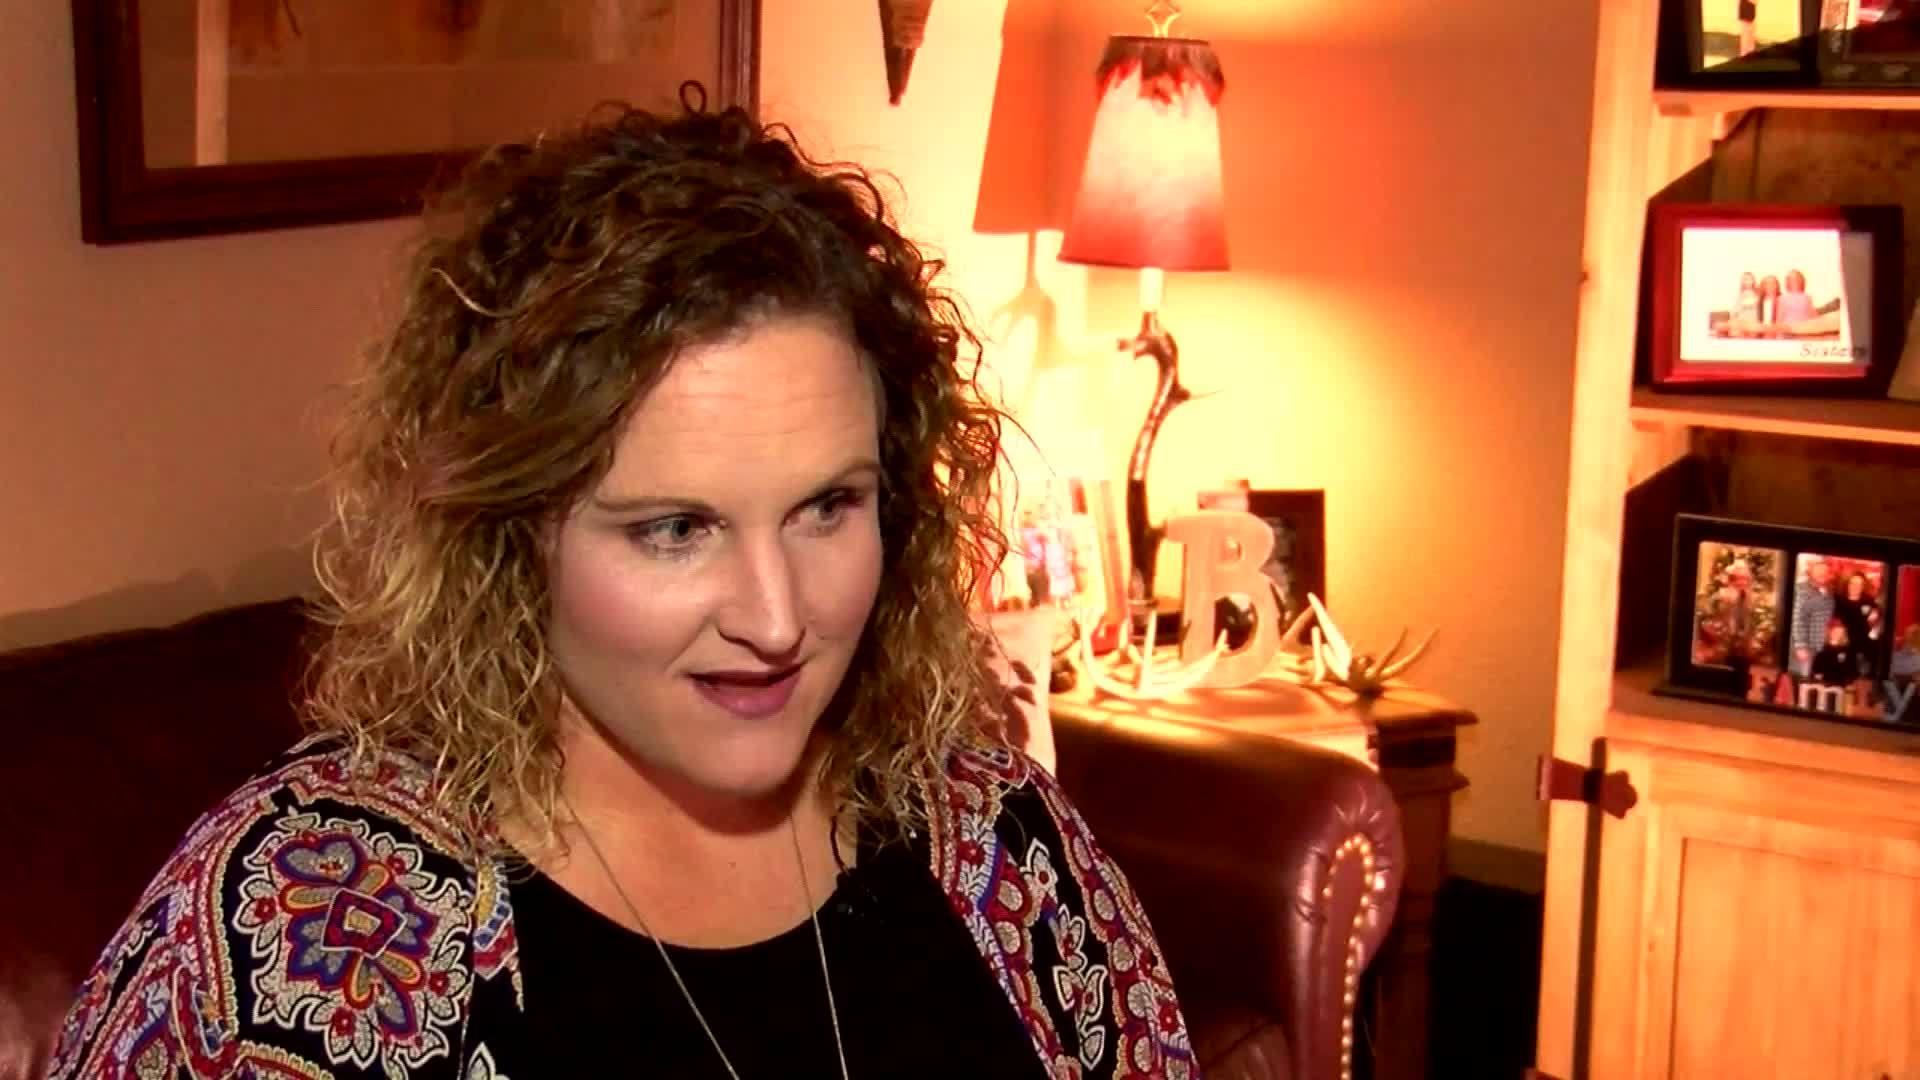 Jonesboro_Victim_Interview_0_20190215022736